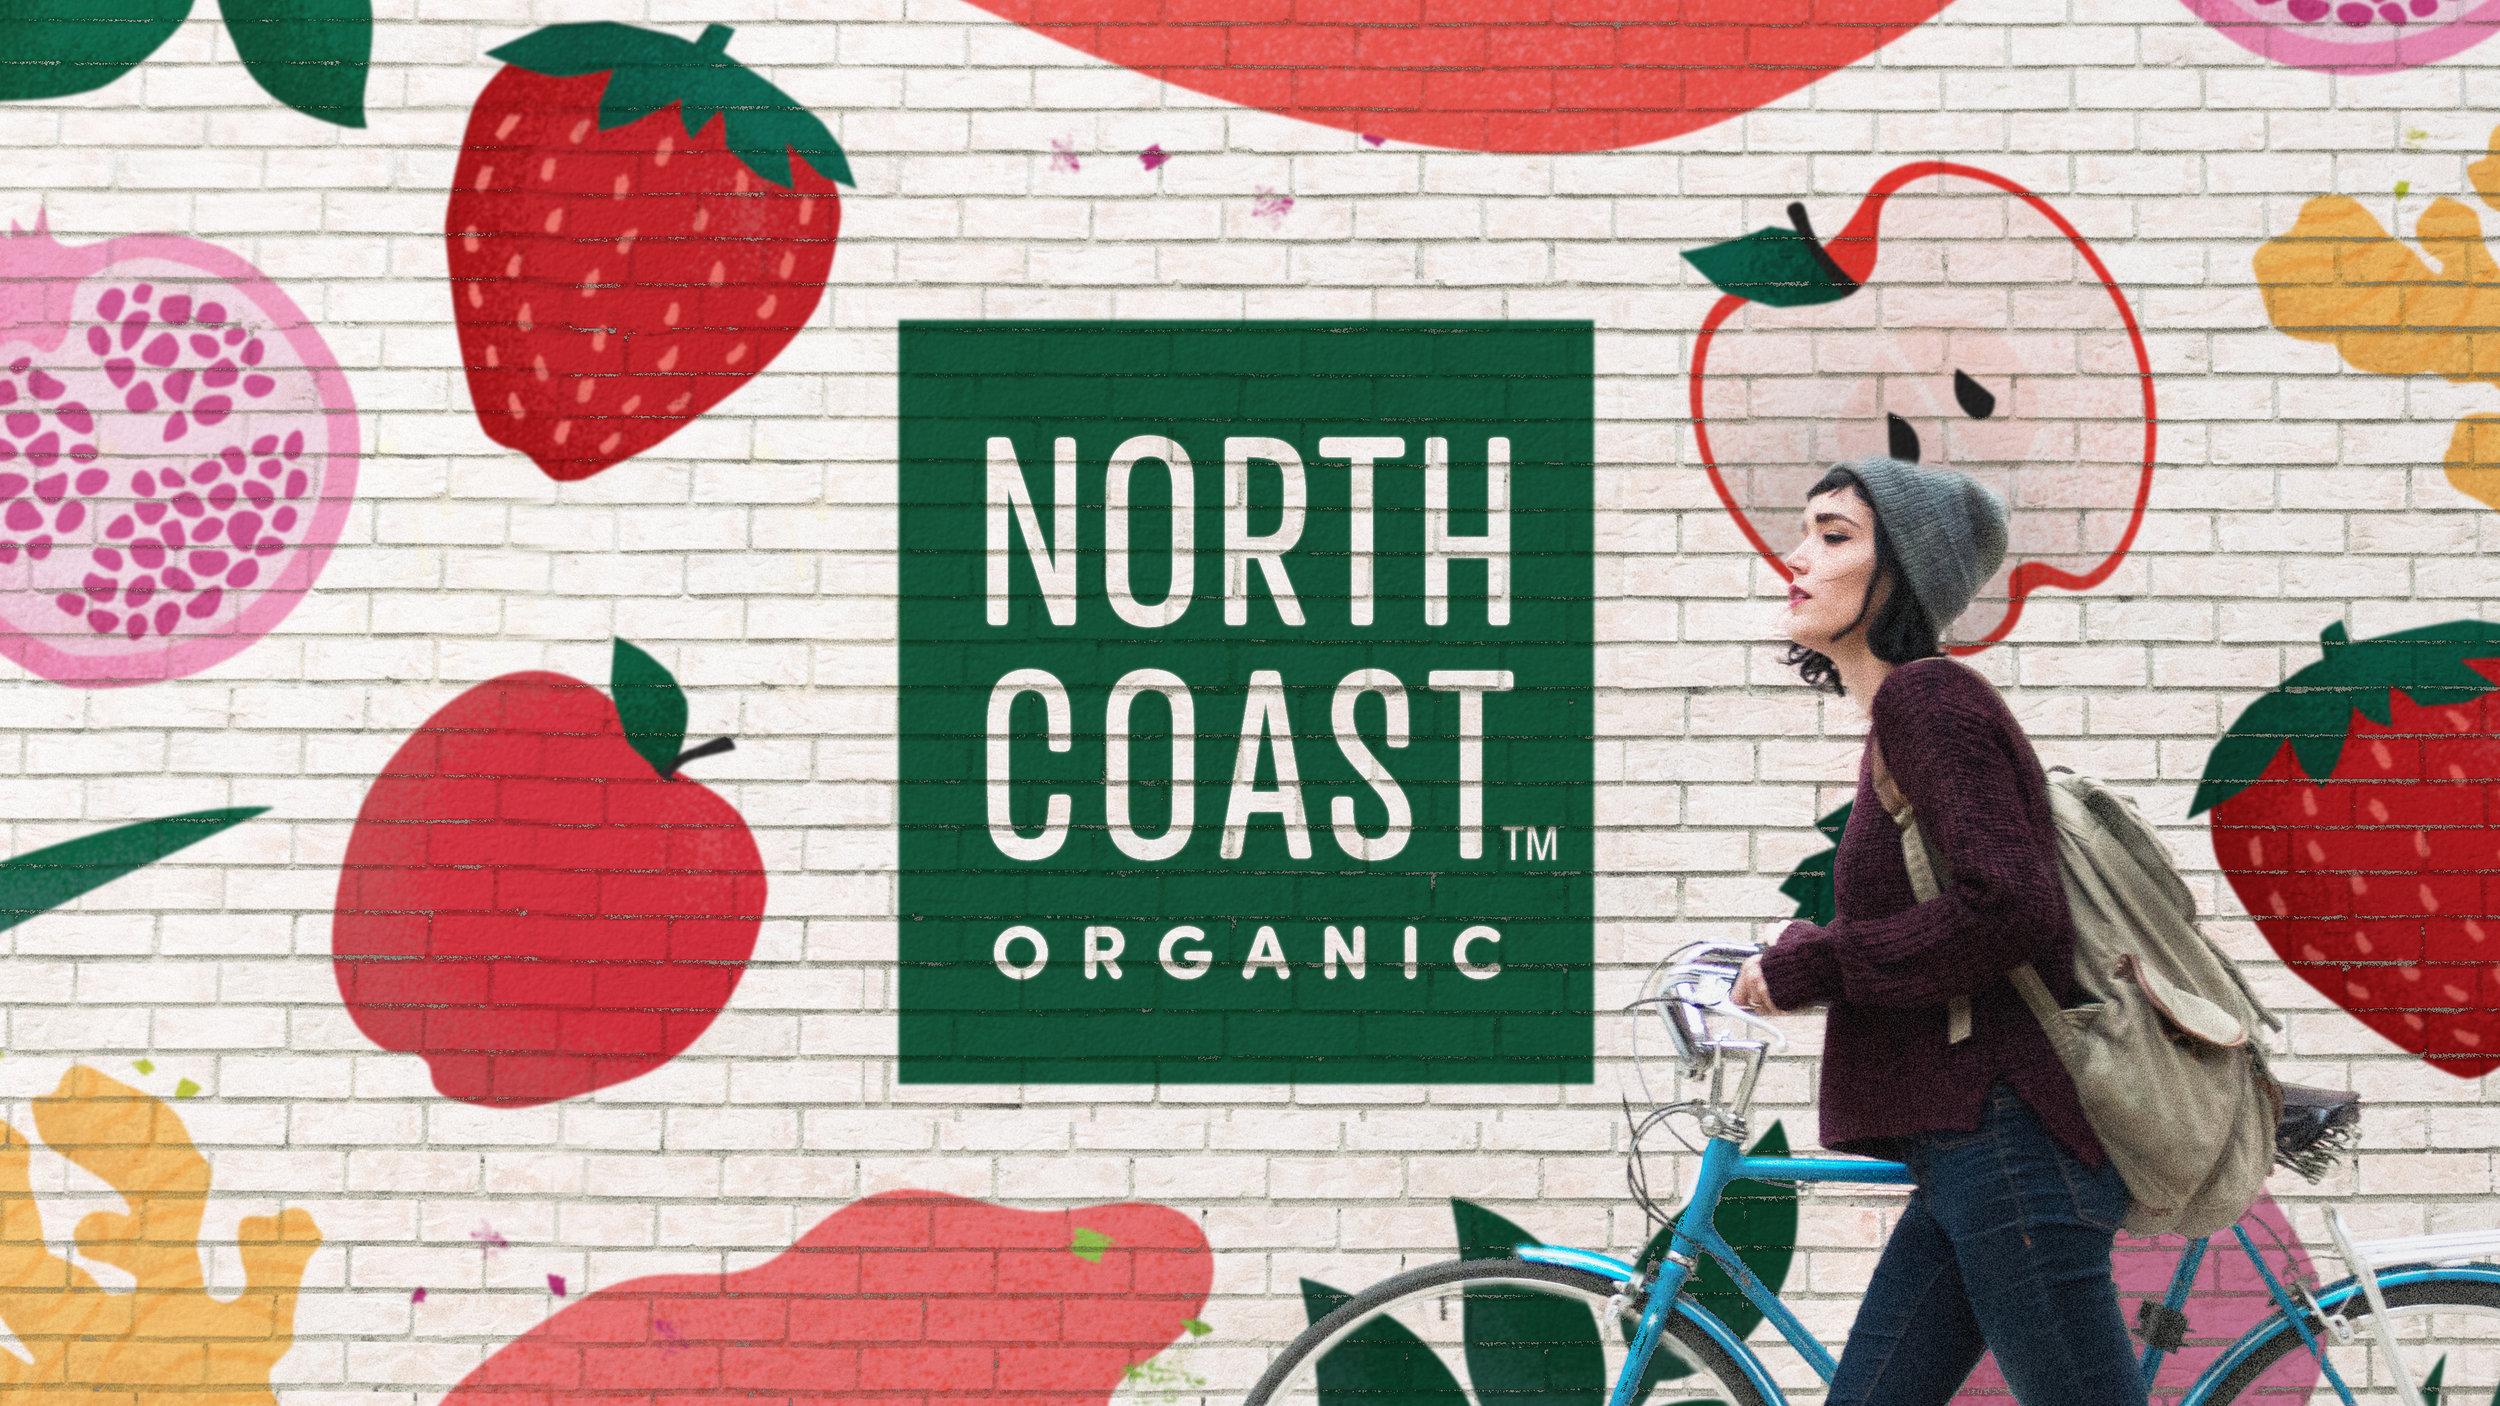 Northcoast organic wall graphic